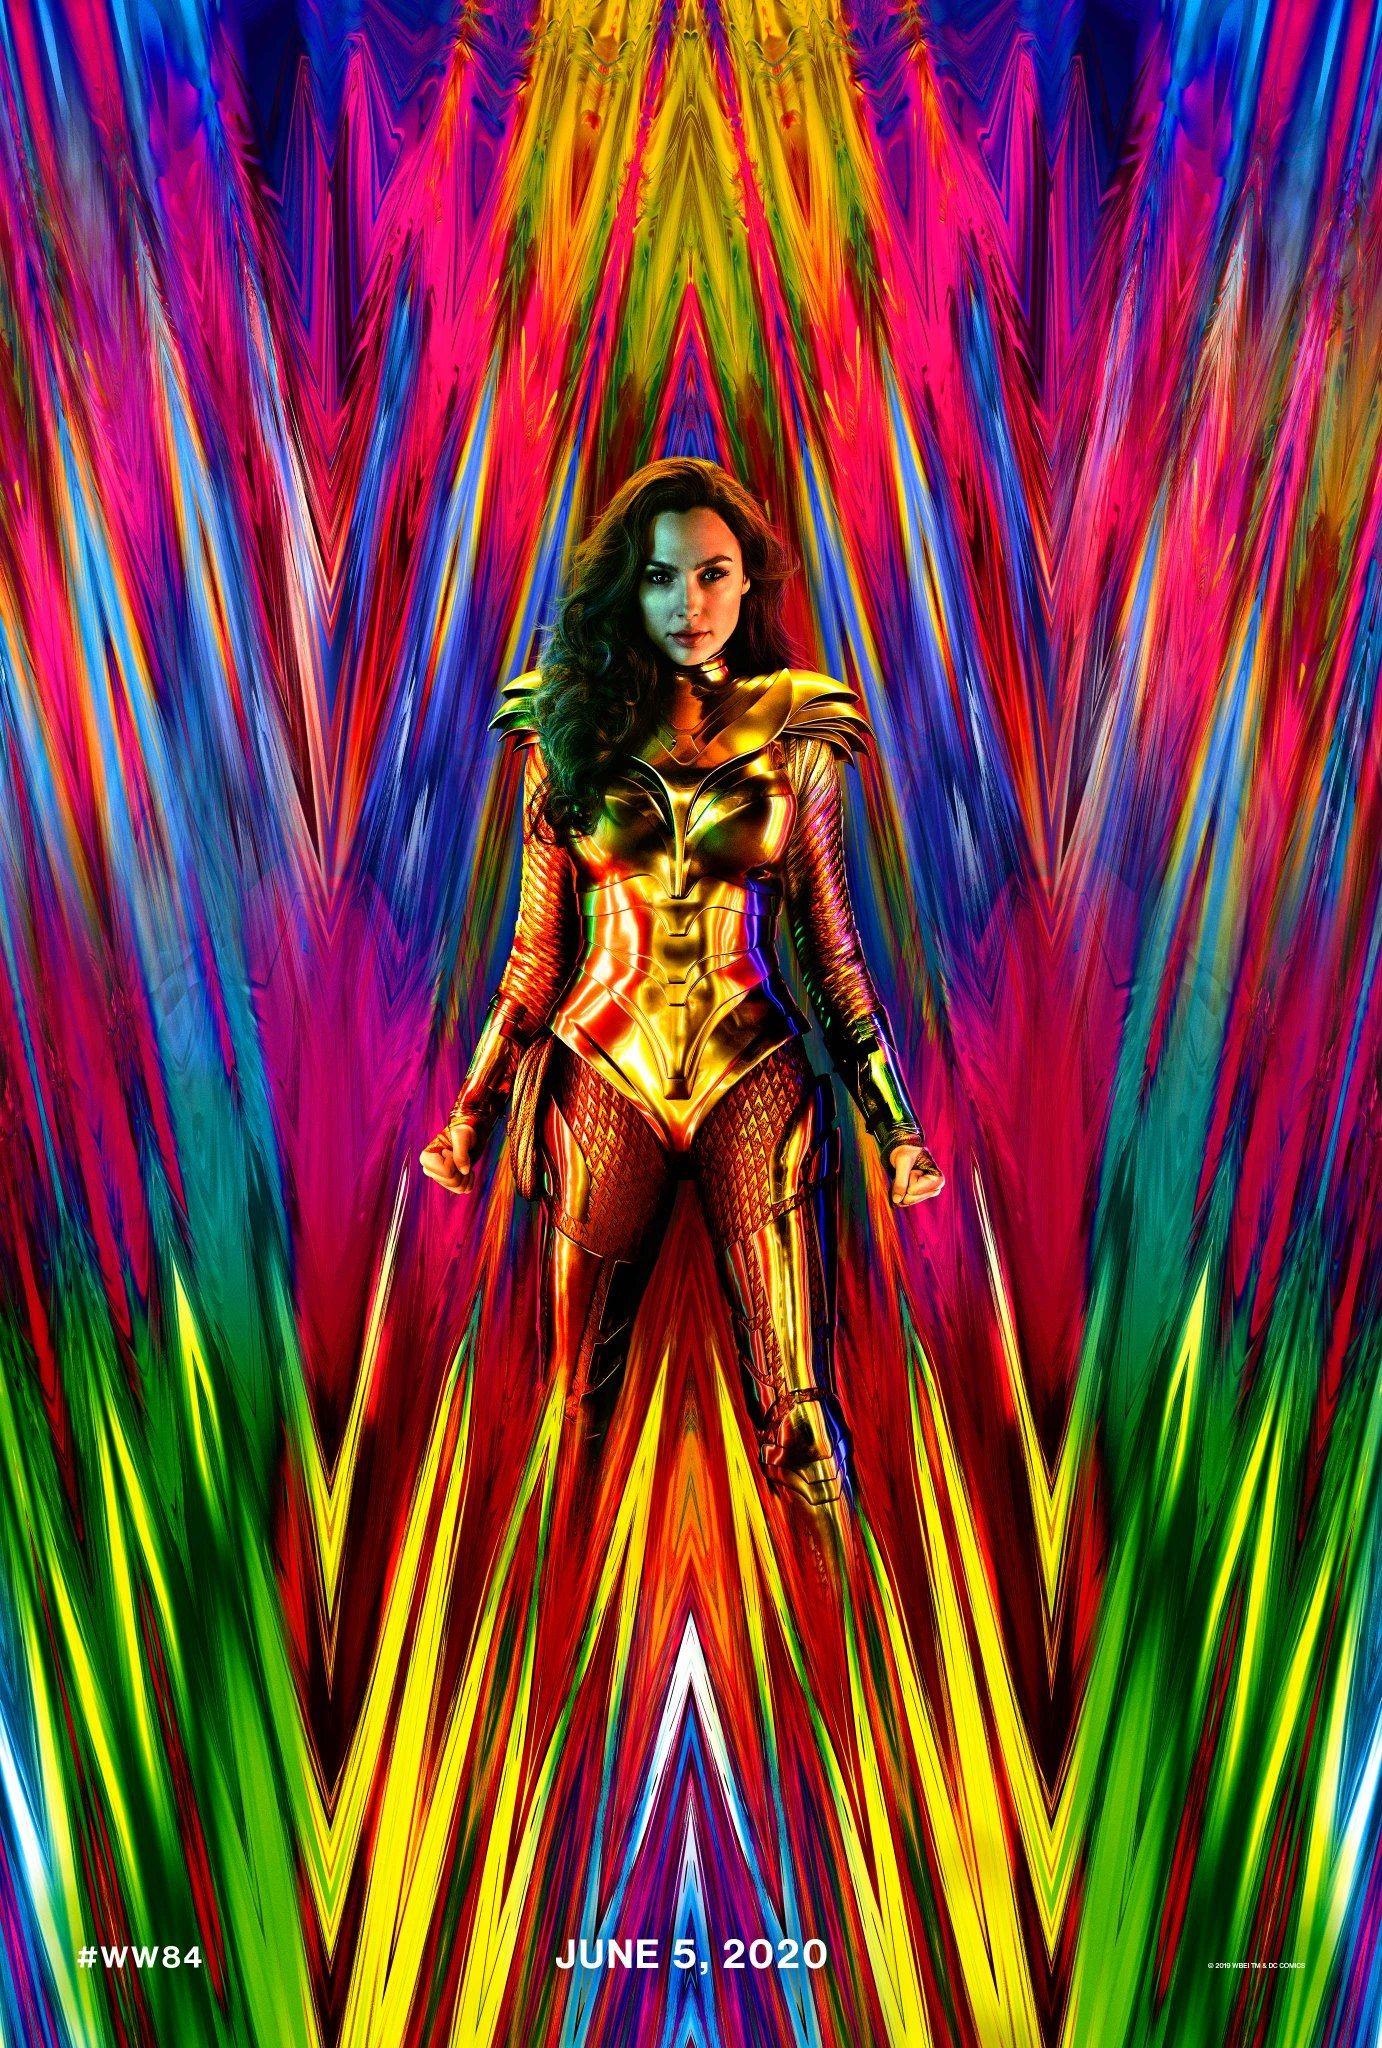 Gal Gadot Net Worth Wiki Height Age Biography Husband Family Mulher Maravilha Wonder Woman Imagens Mulher Maravilha